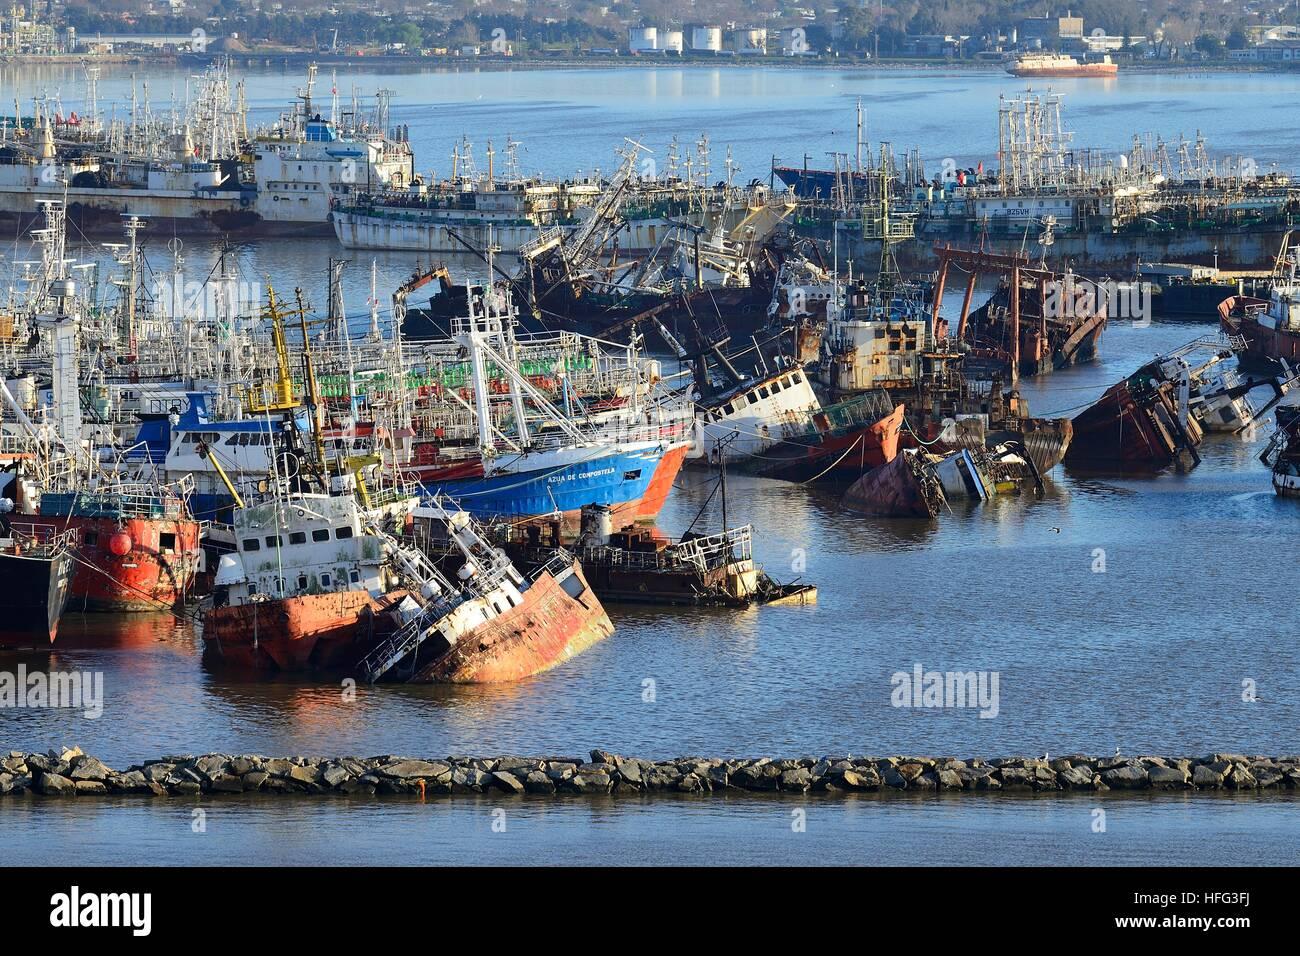 Rusted buques en el puerto, Montevideo, Uruguay Imagen De Stock